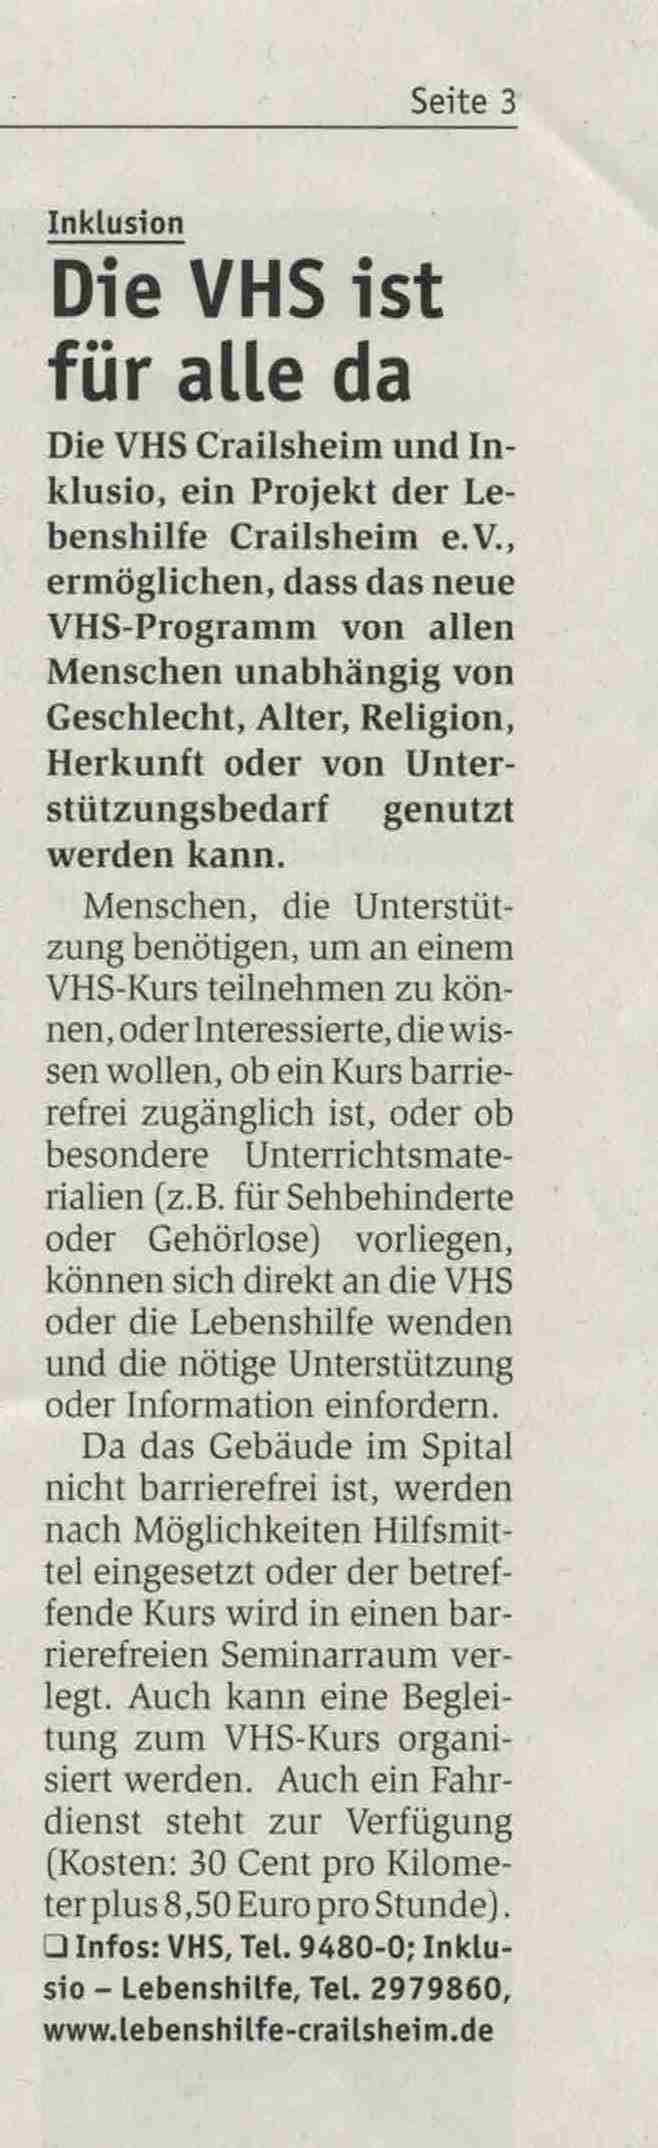 Stadtblatt 2015-2.jpg - 88.80 KB